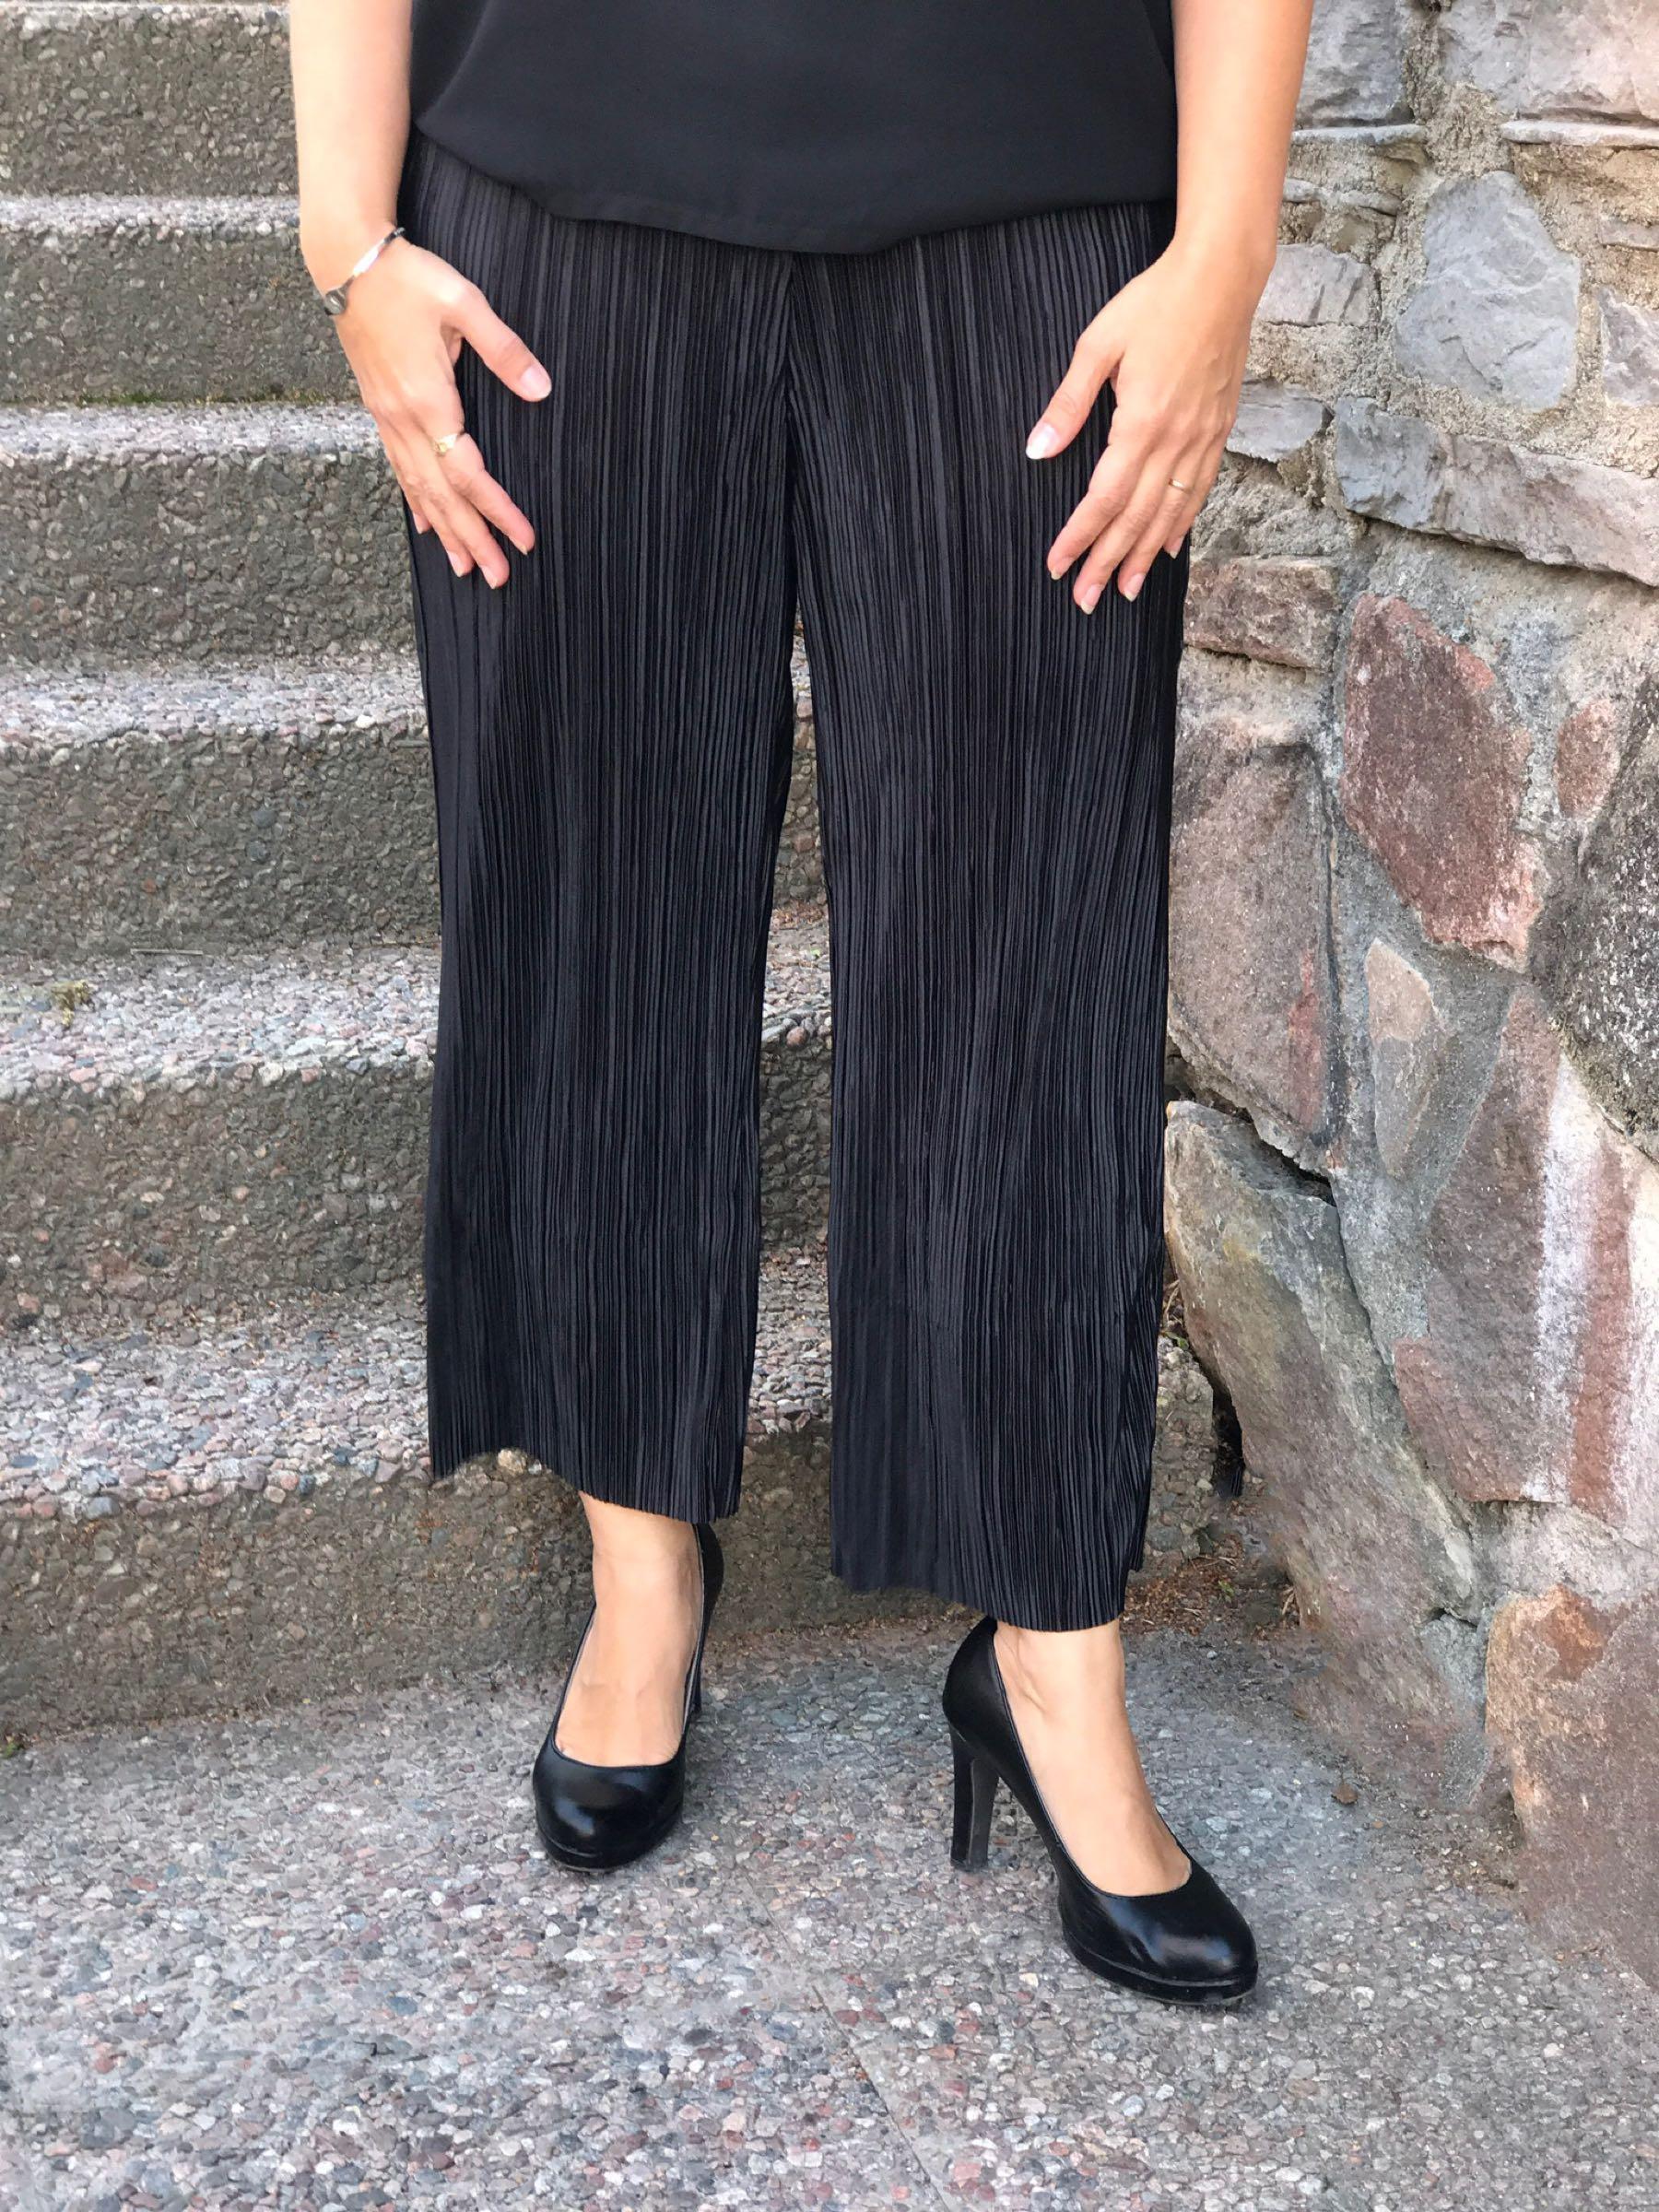 Mista pants, black